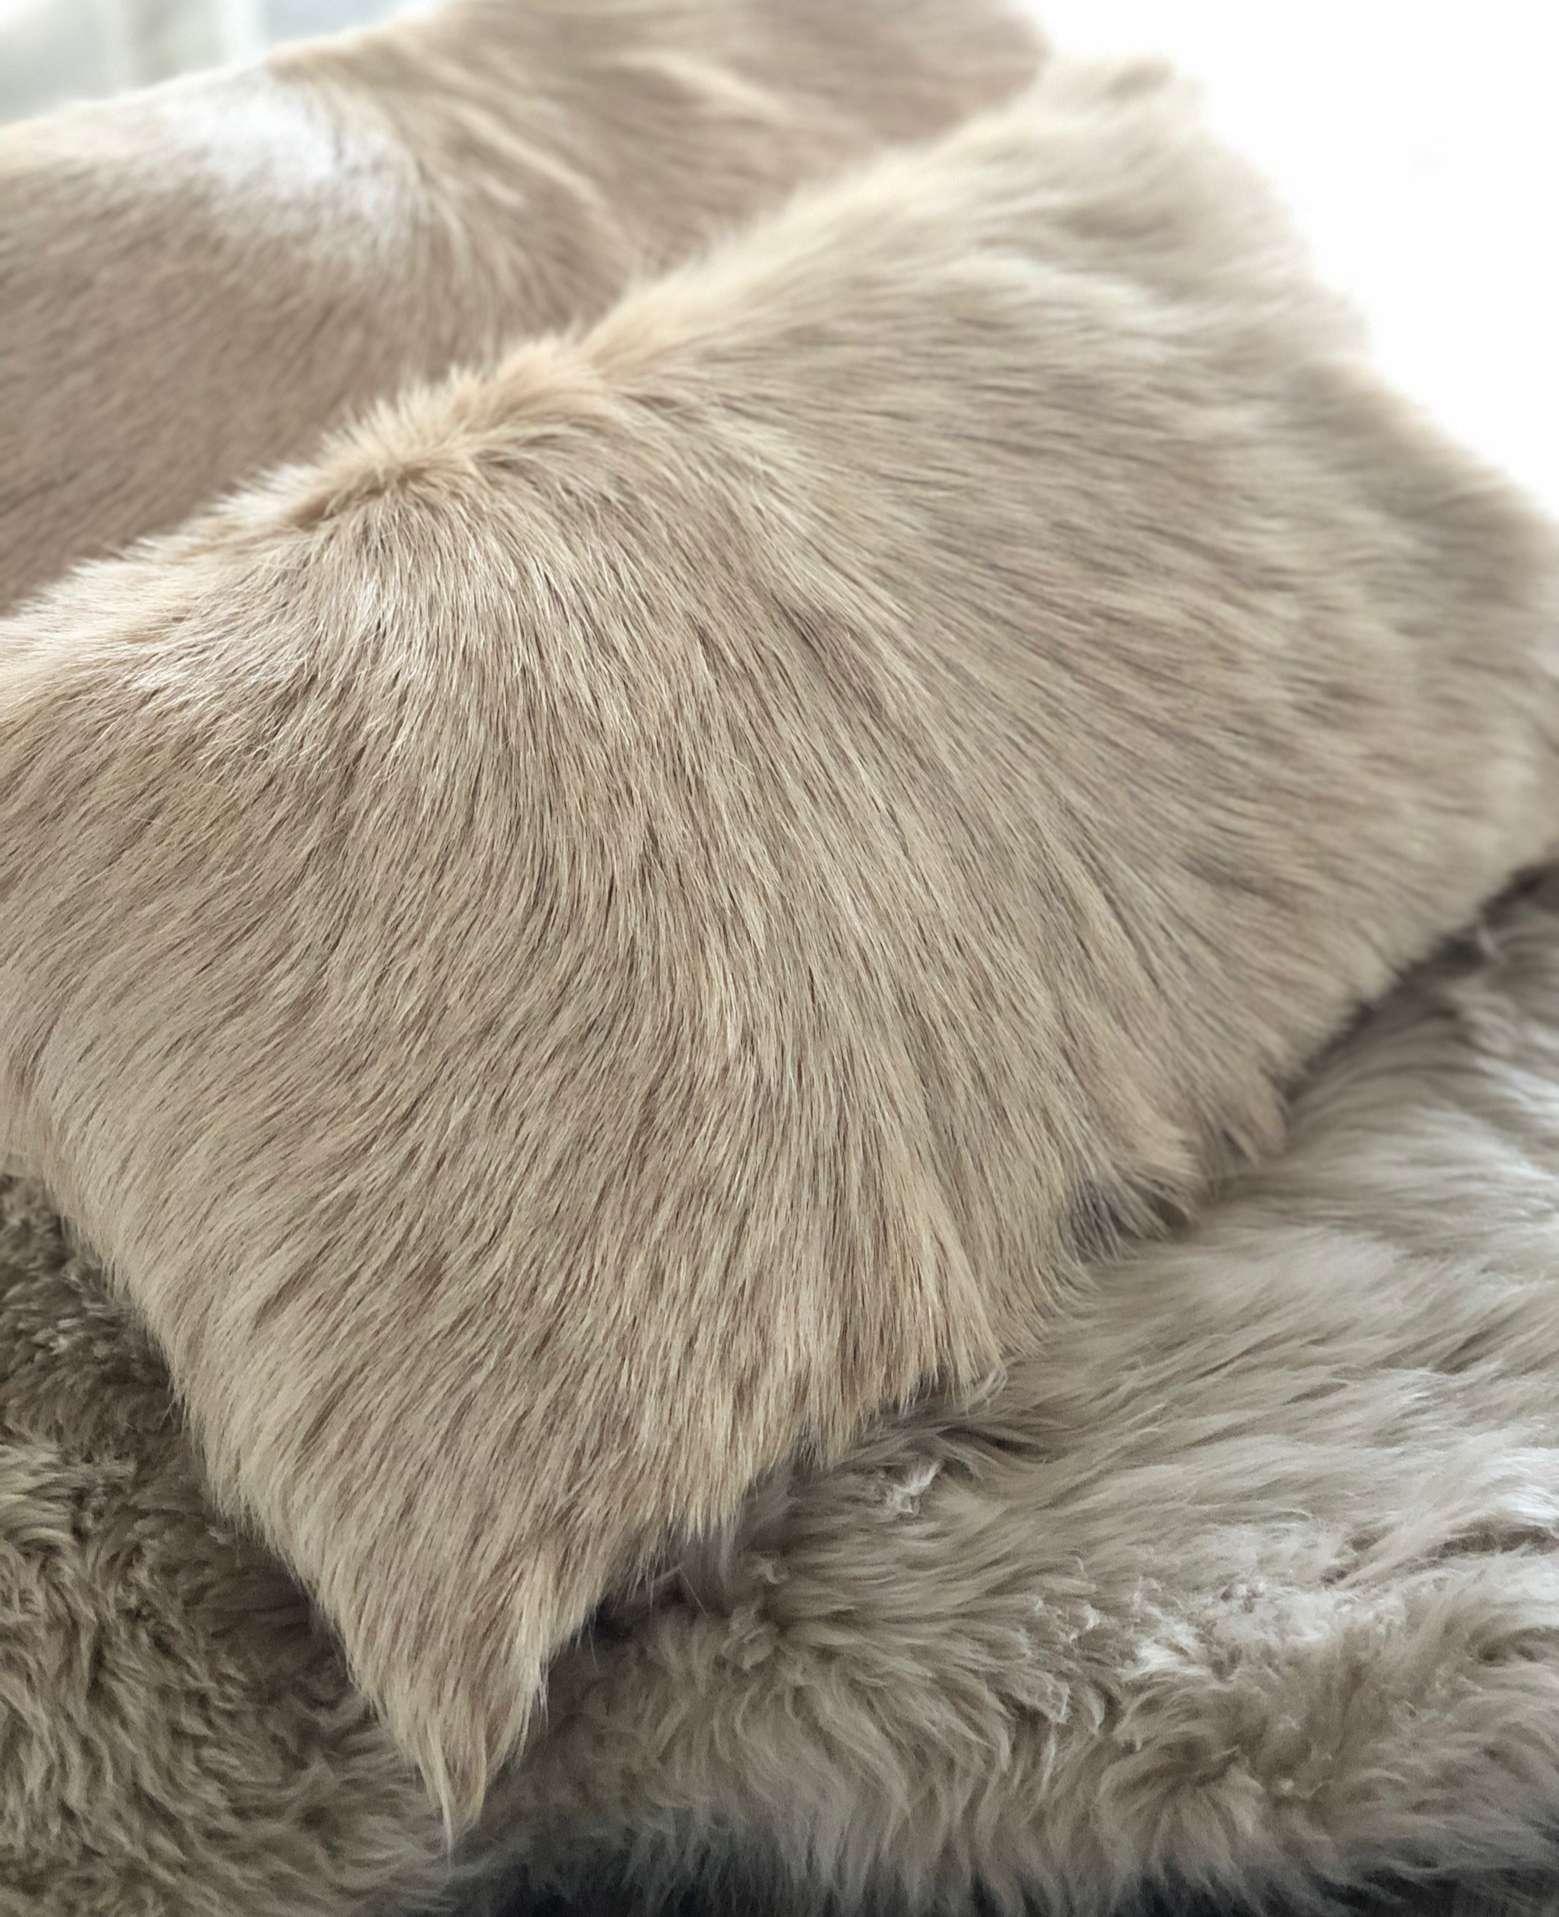 kissen dekokissen ziegenfell echt fell beige camel 50 30. Black Bedroom Furniture Sets. Home Design Ideas